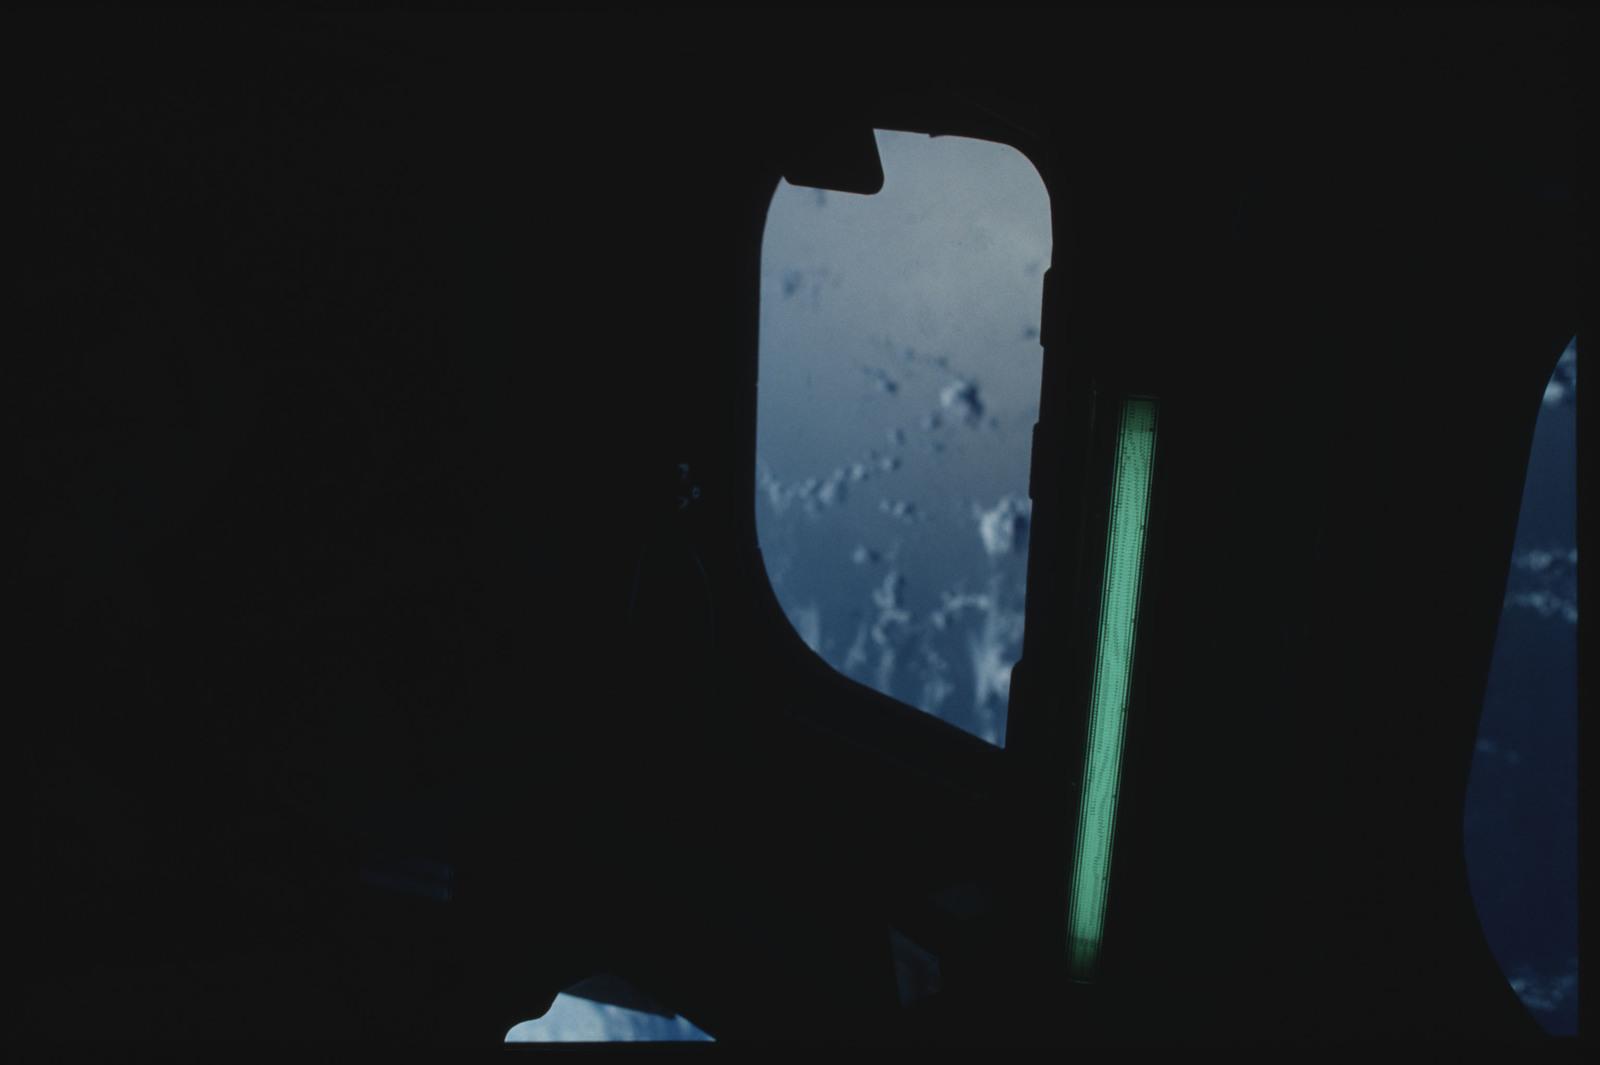 S09-02-043 - STS-009 - Flight deck windows